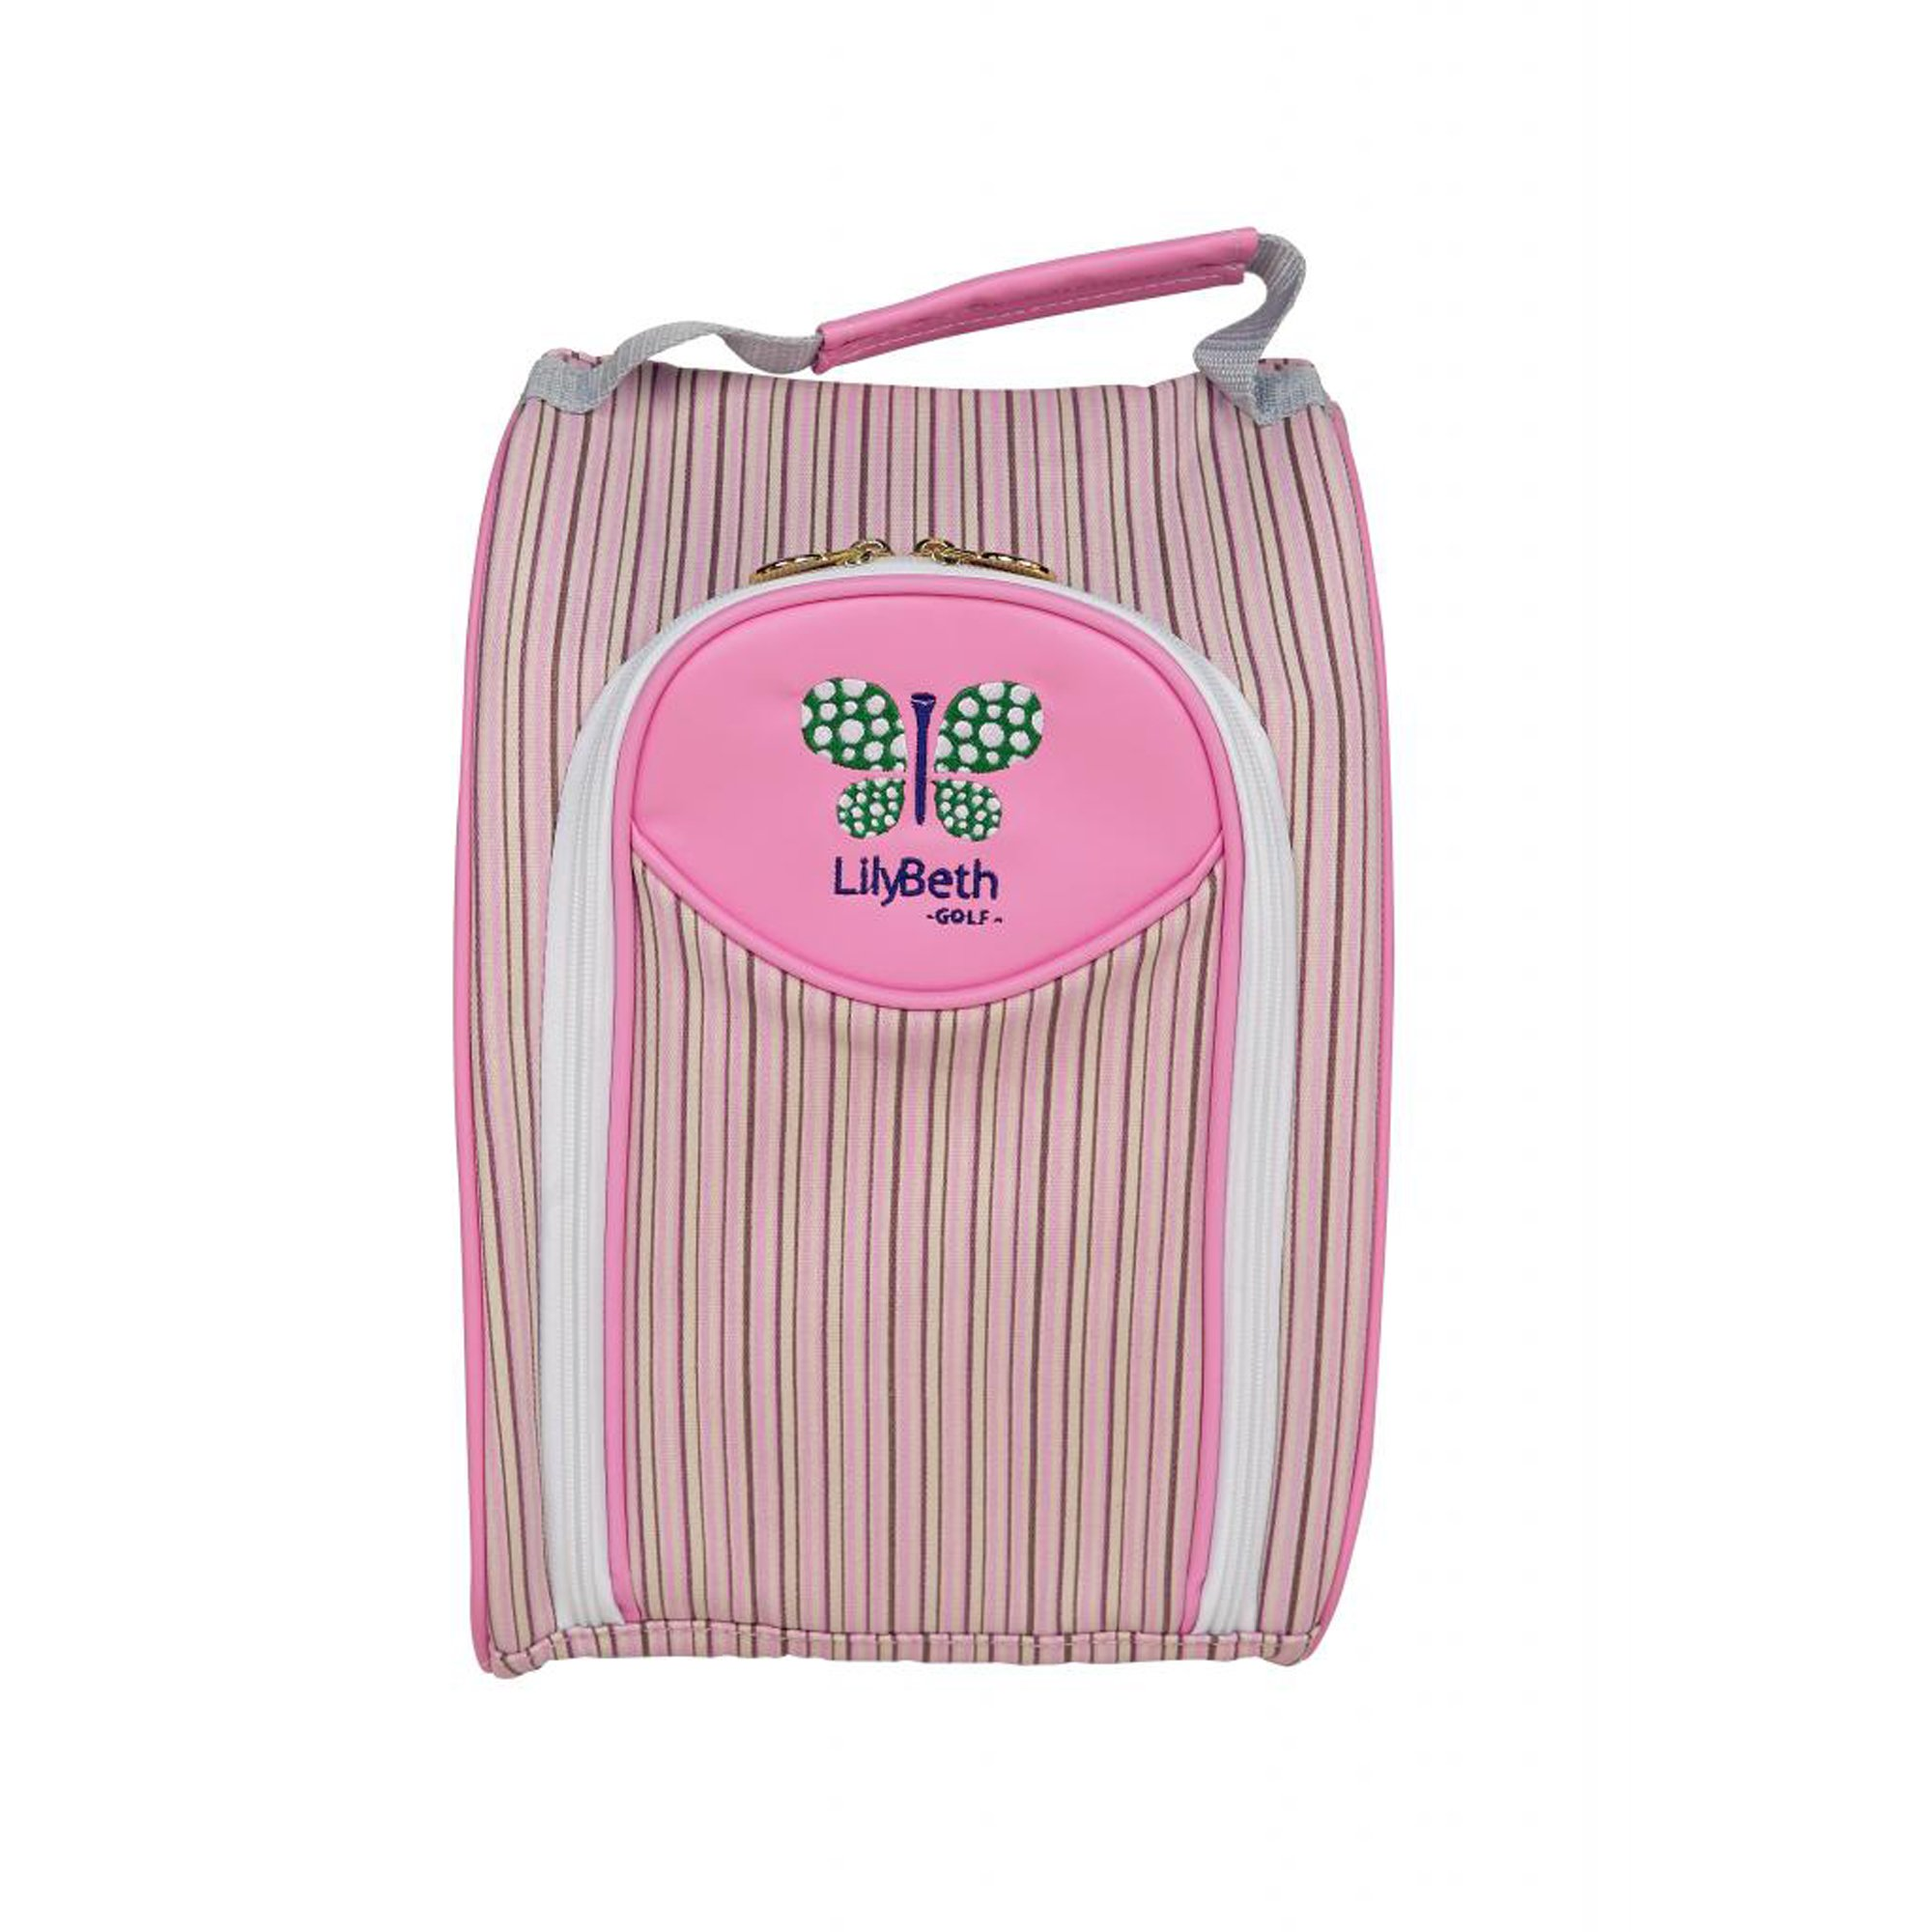 LilyBeth GOLF Shoe Bag, Neapolitan